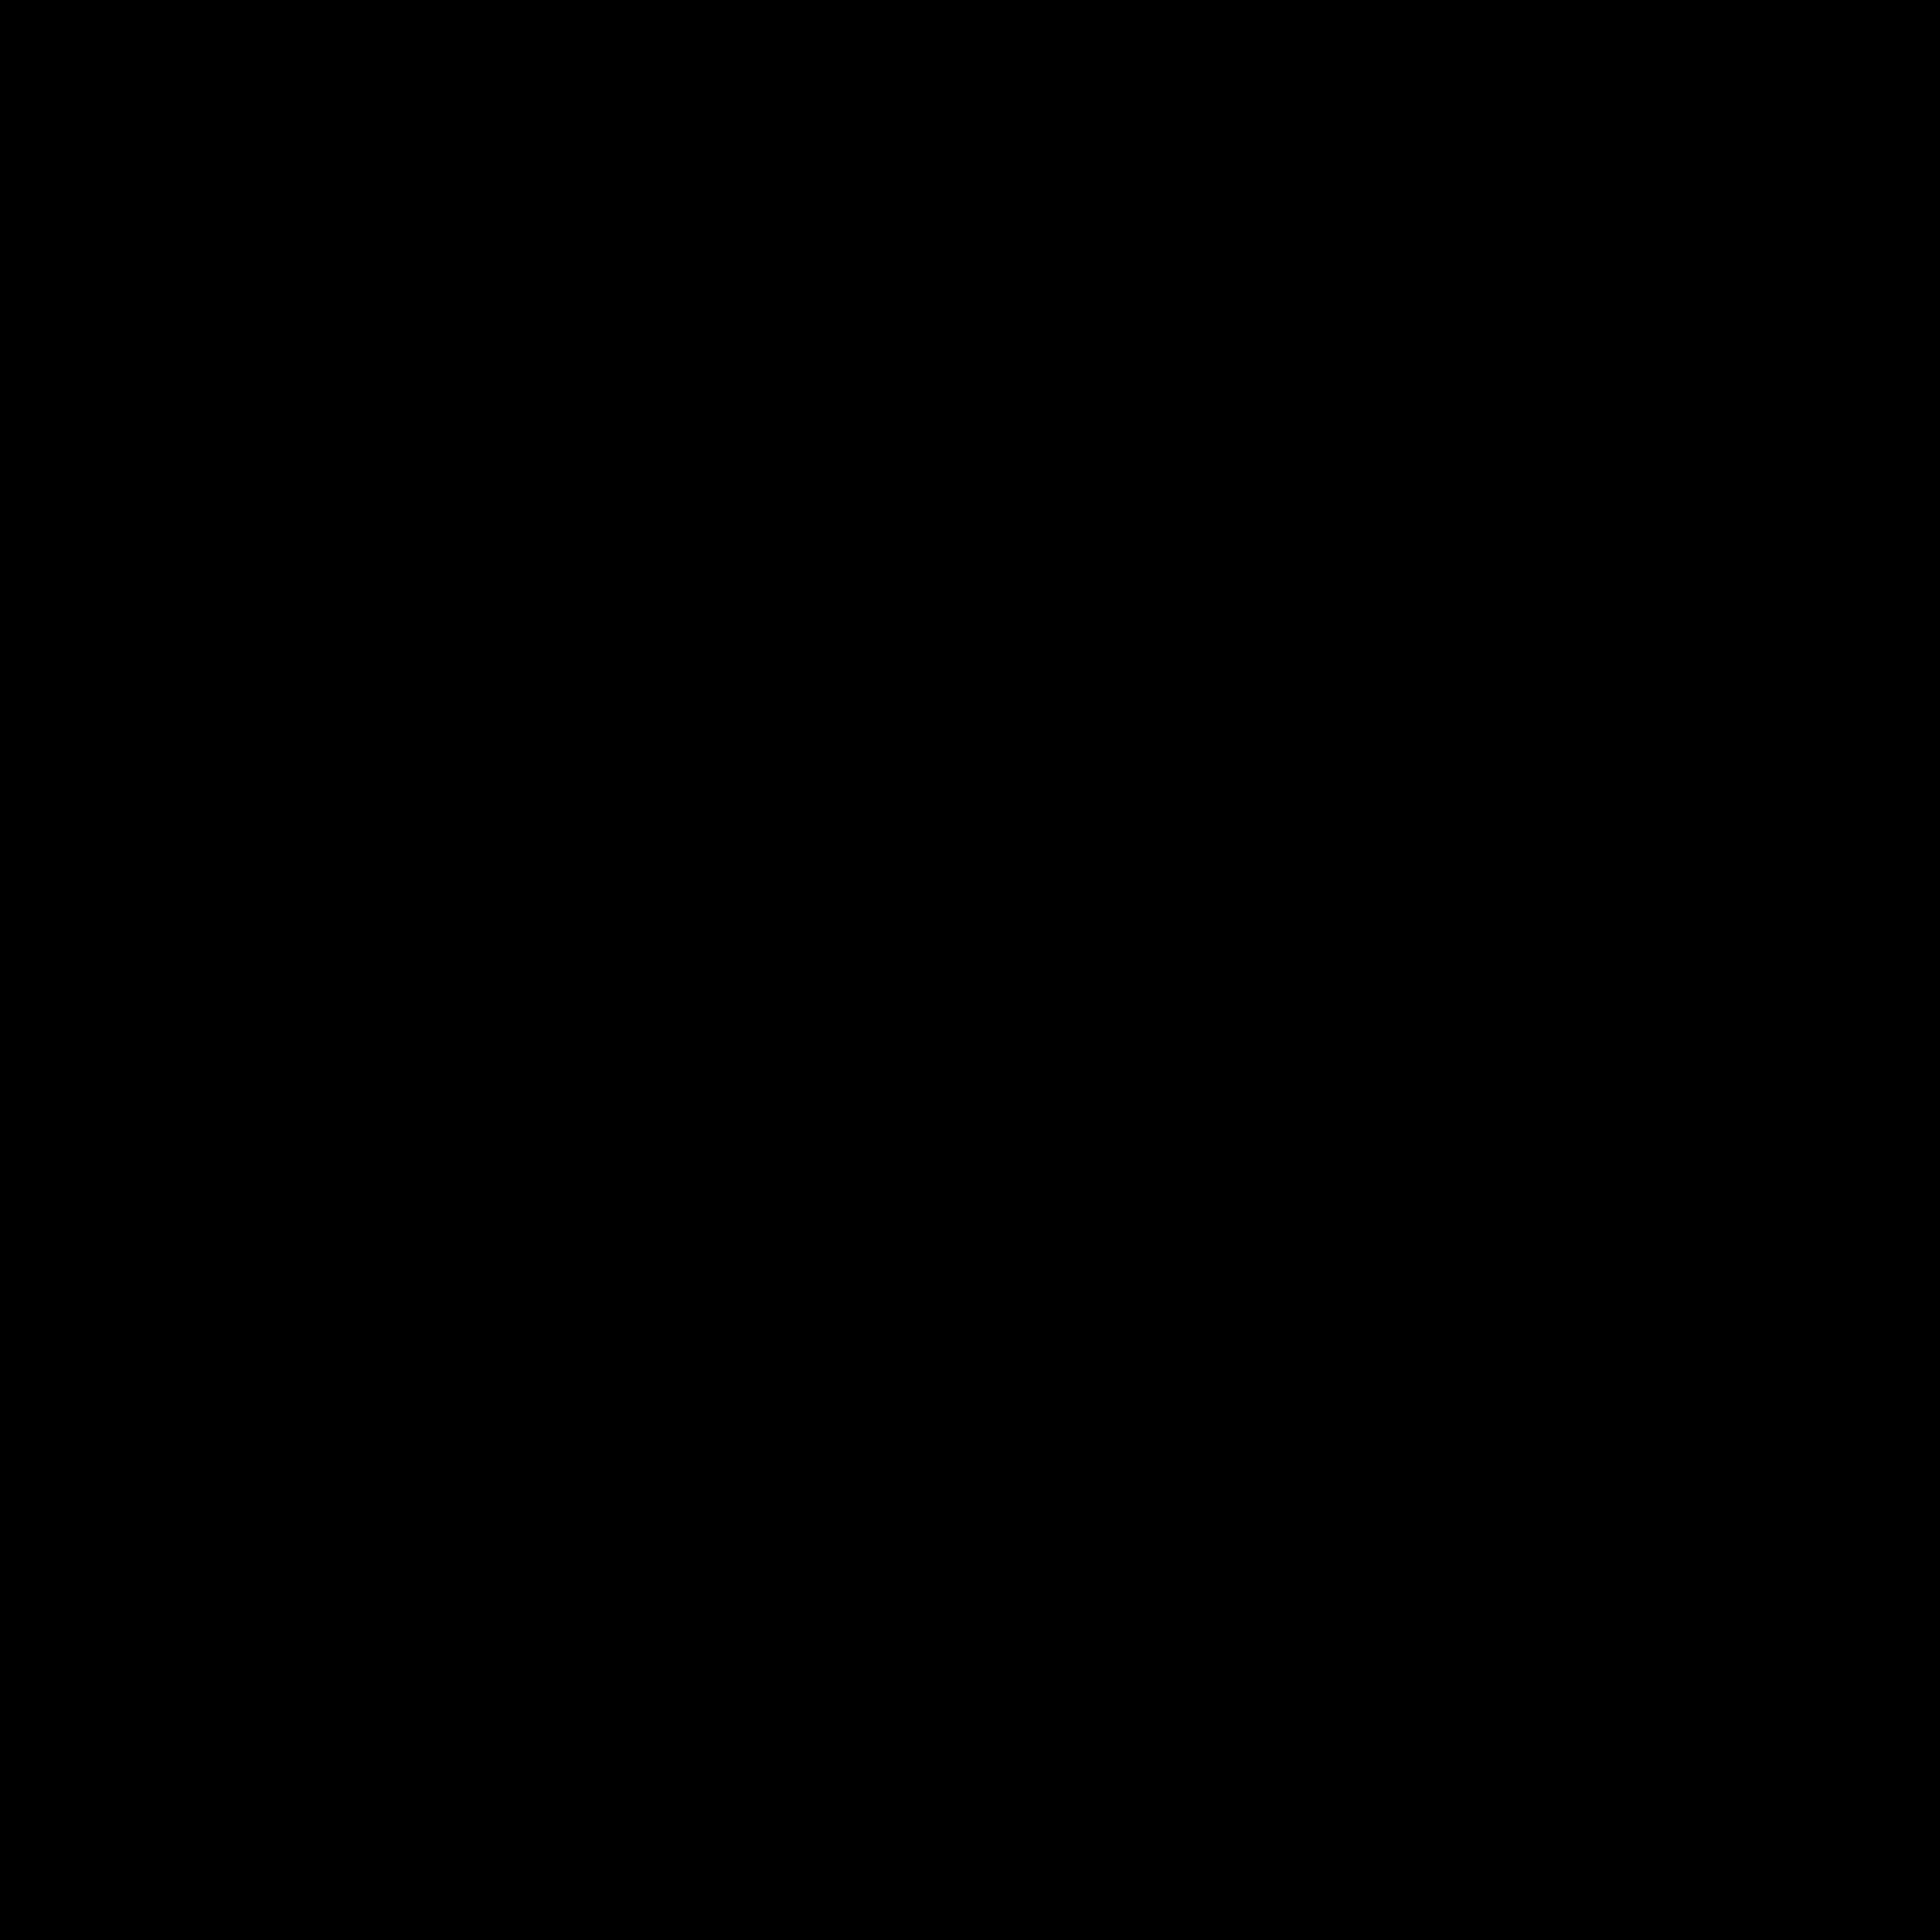 Victorian Frame PNG - 54443